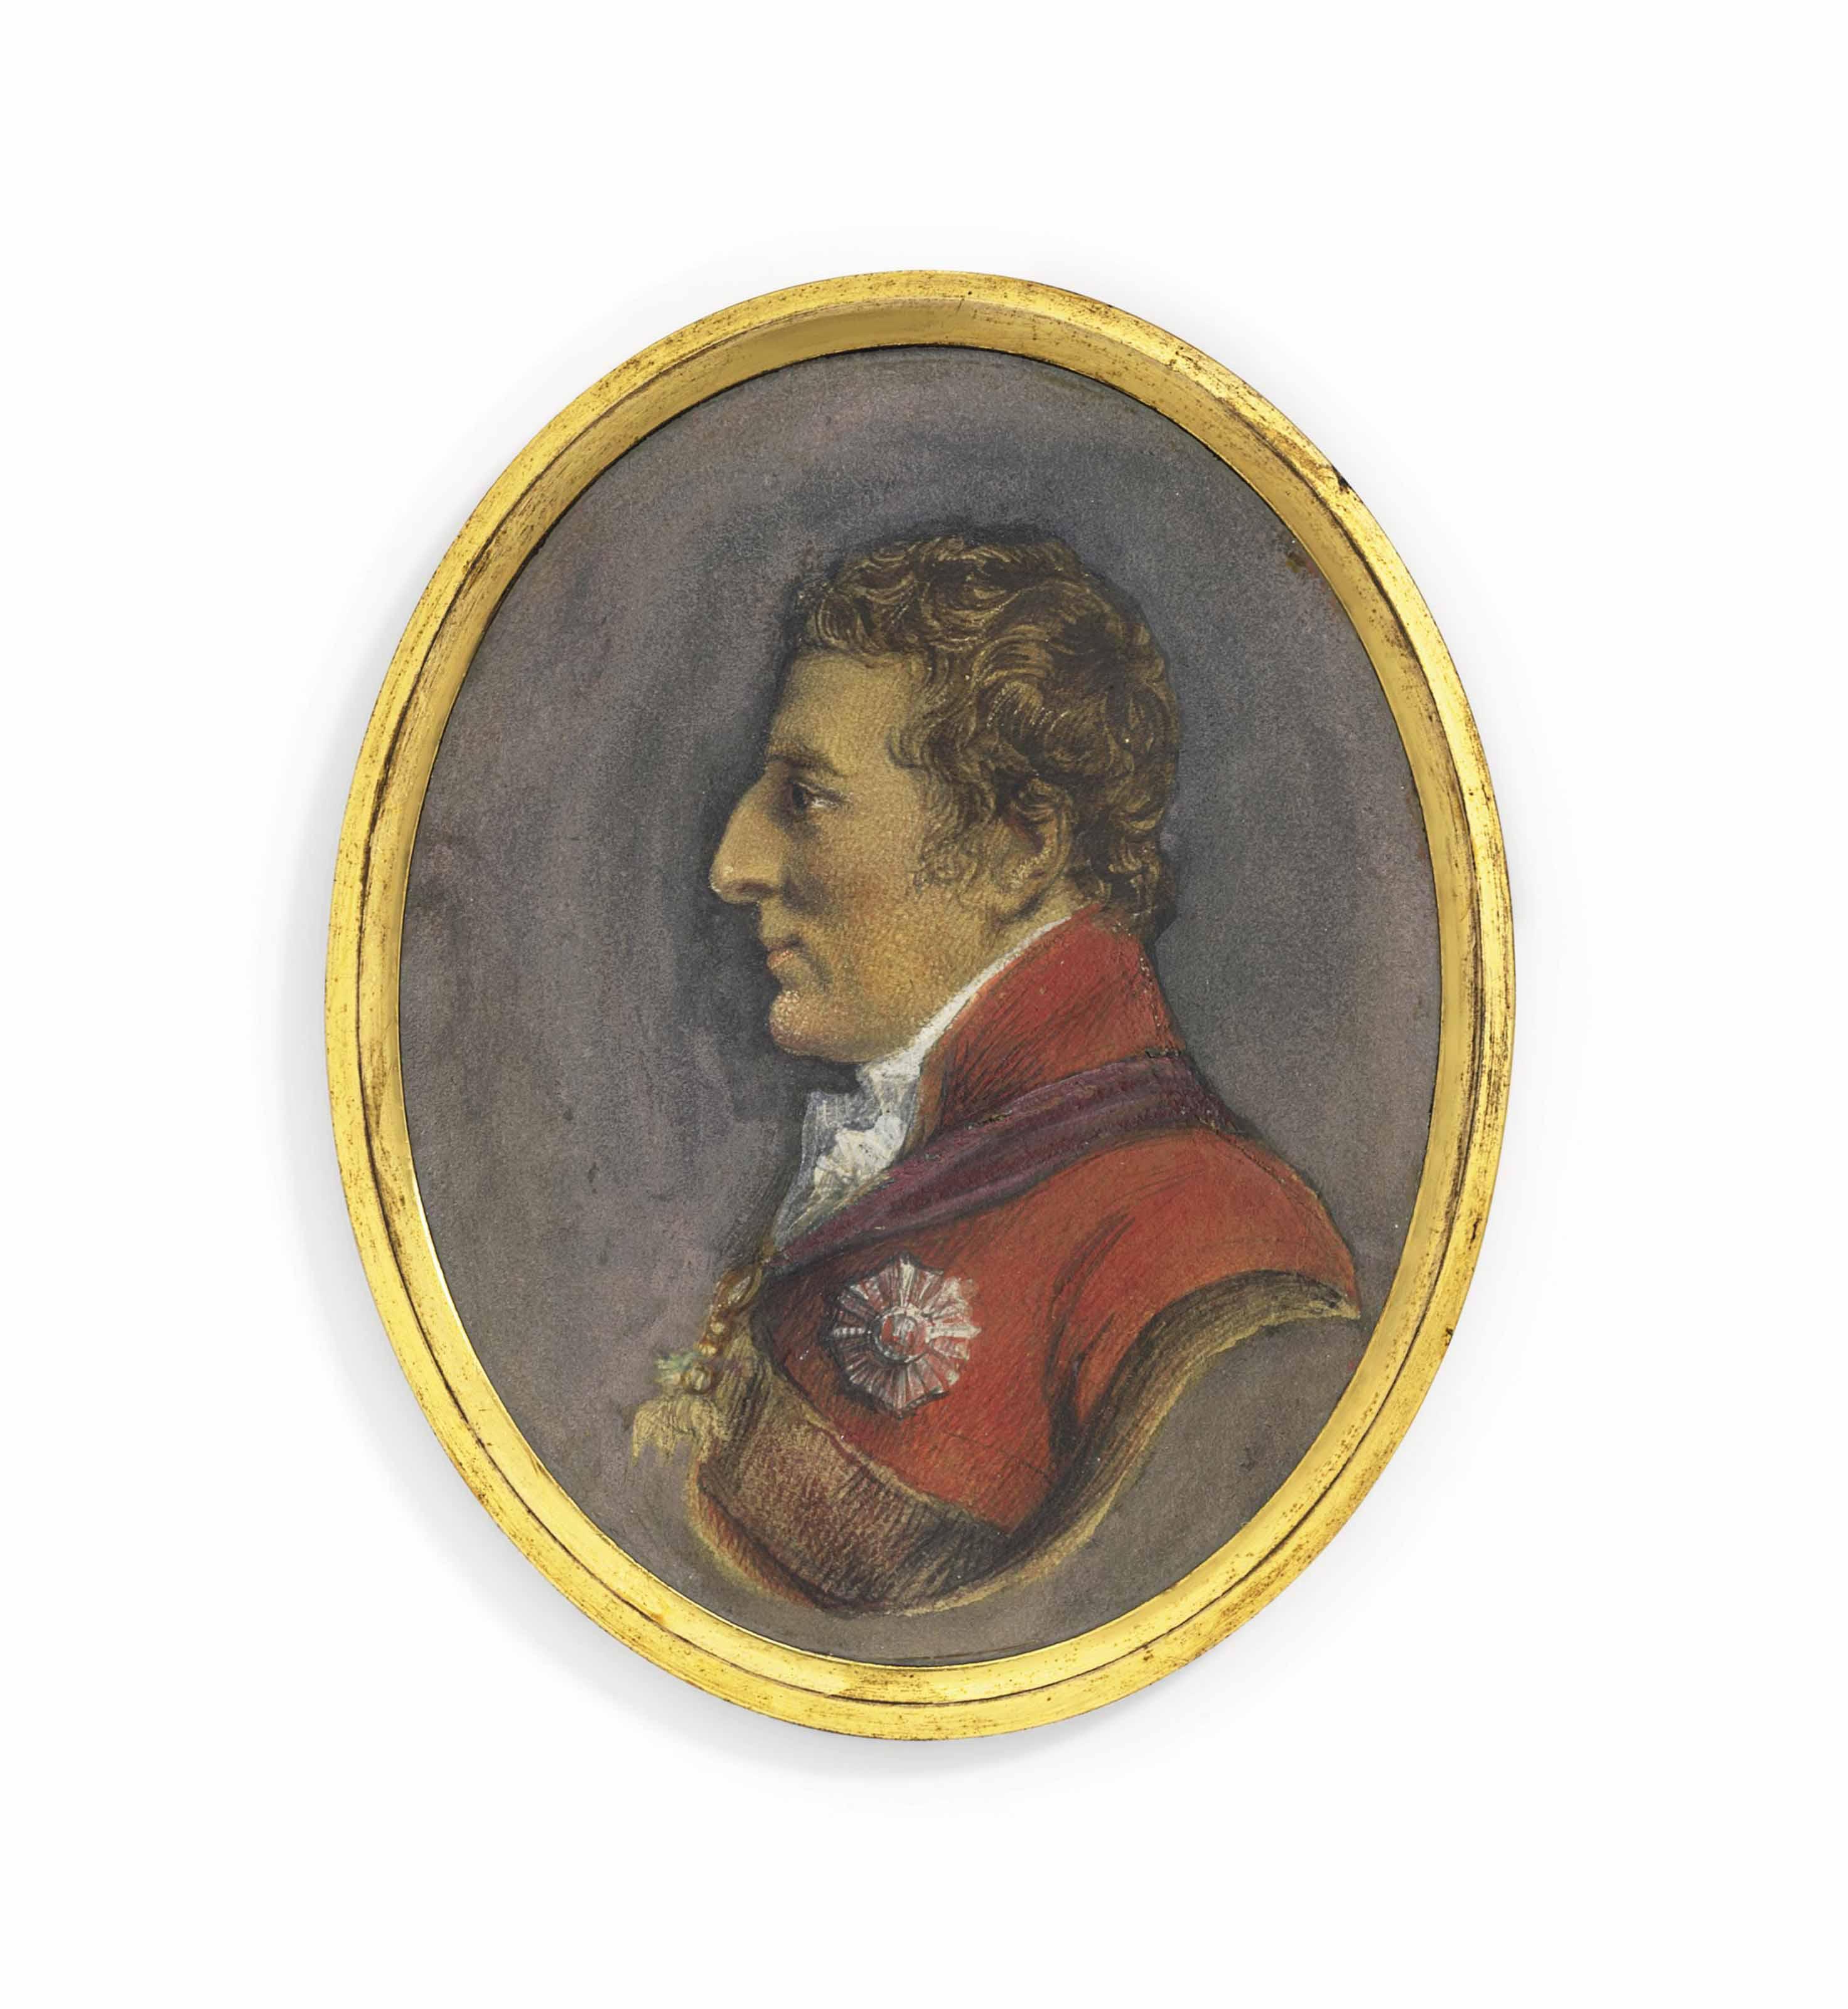 AFTER ROBERT HOME (BRITISH, 1752-1834)